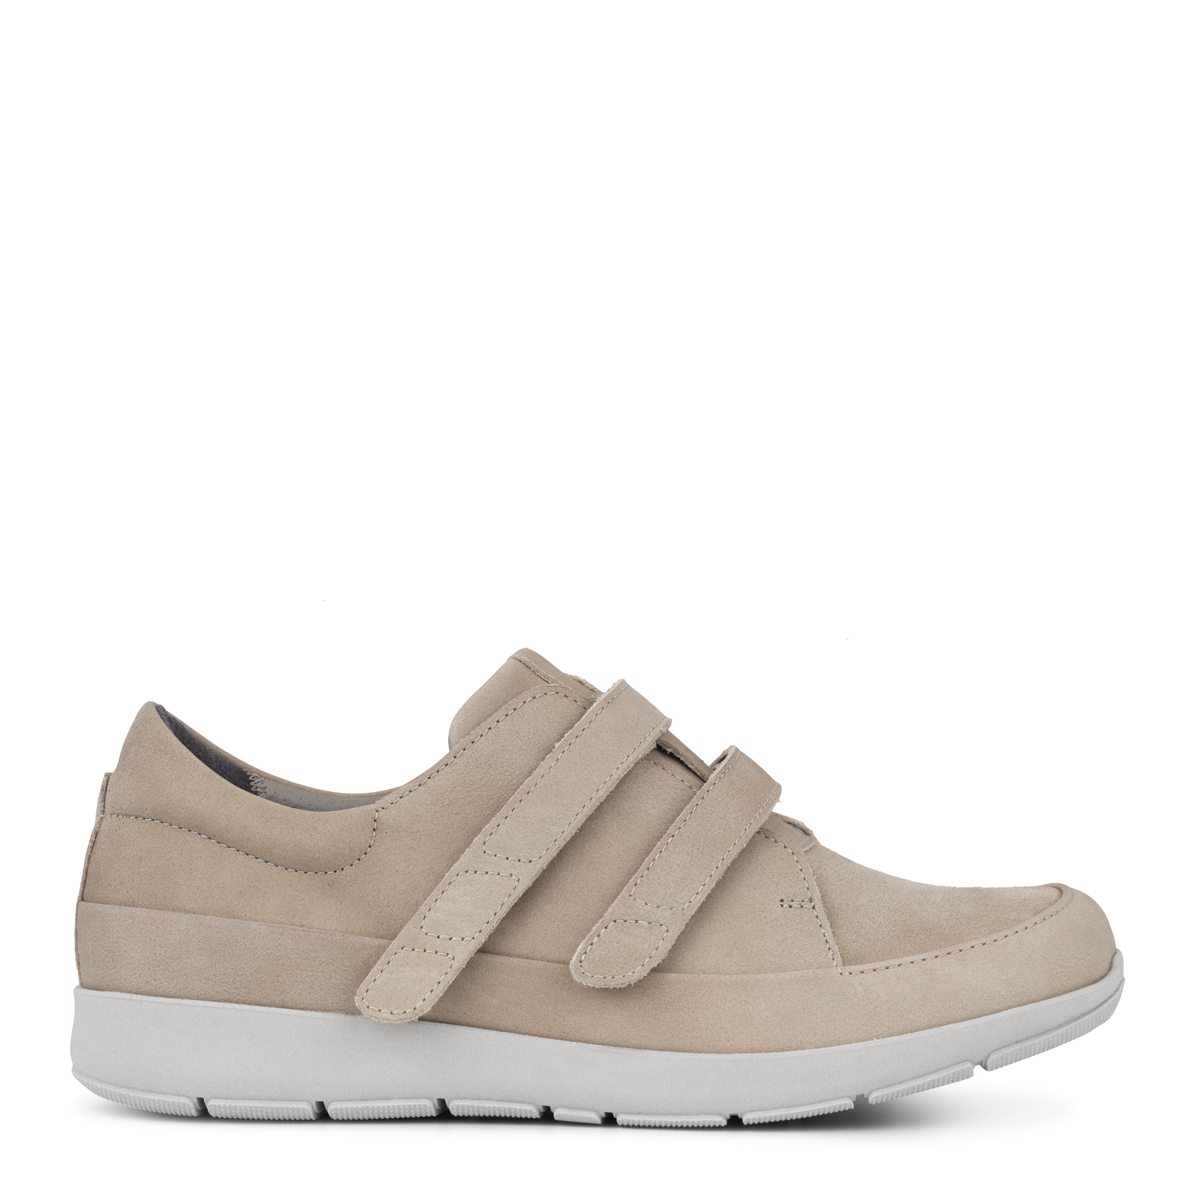 New Feet damesko i sand